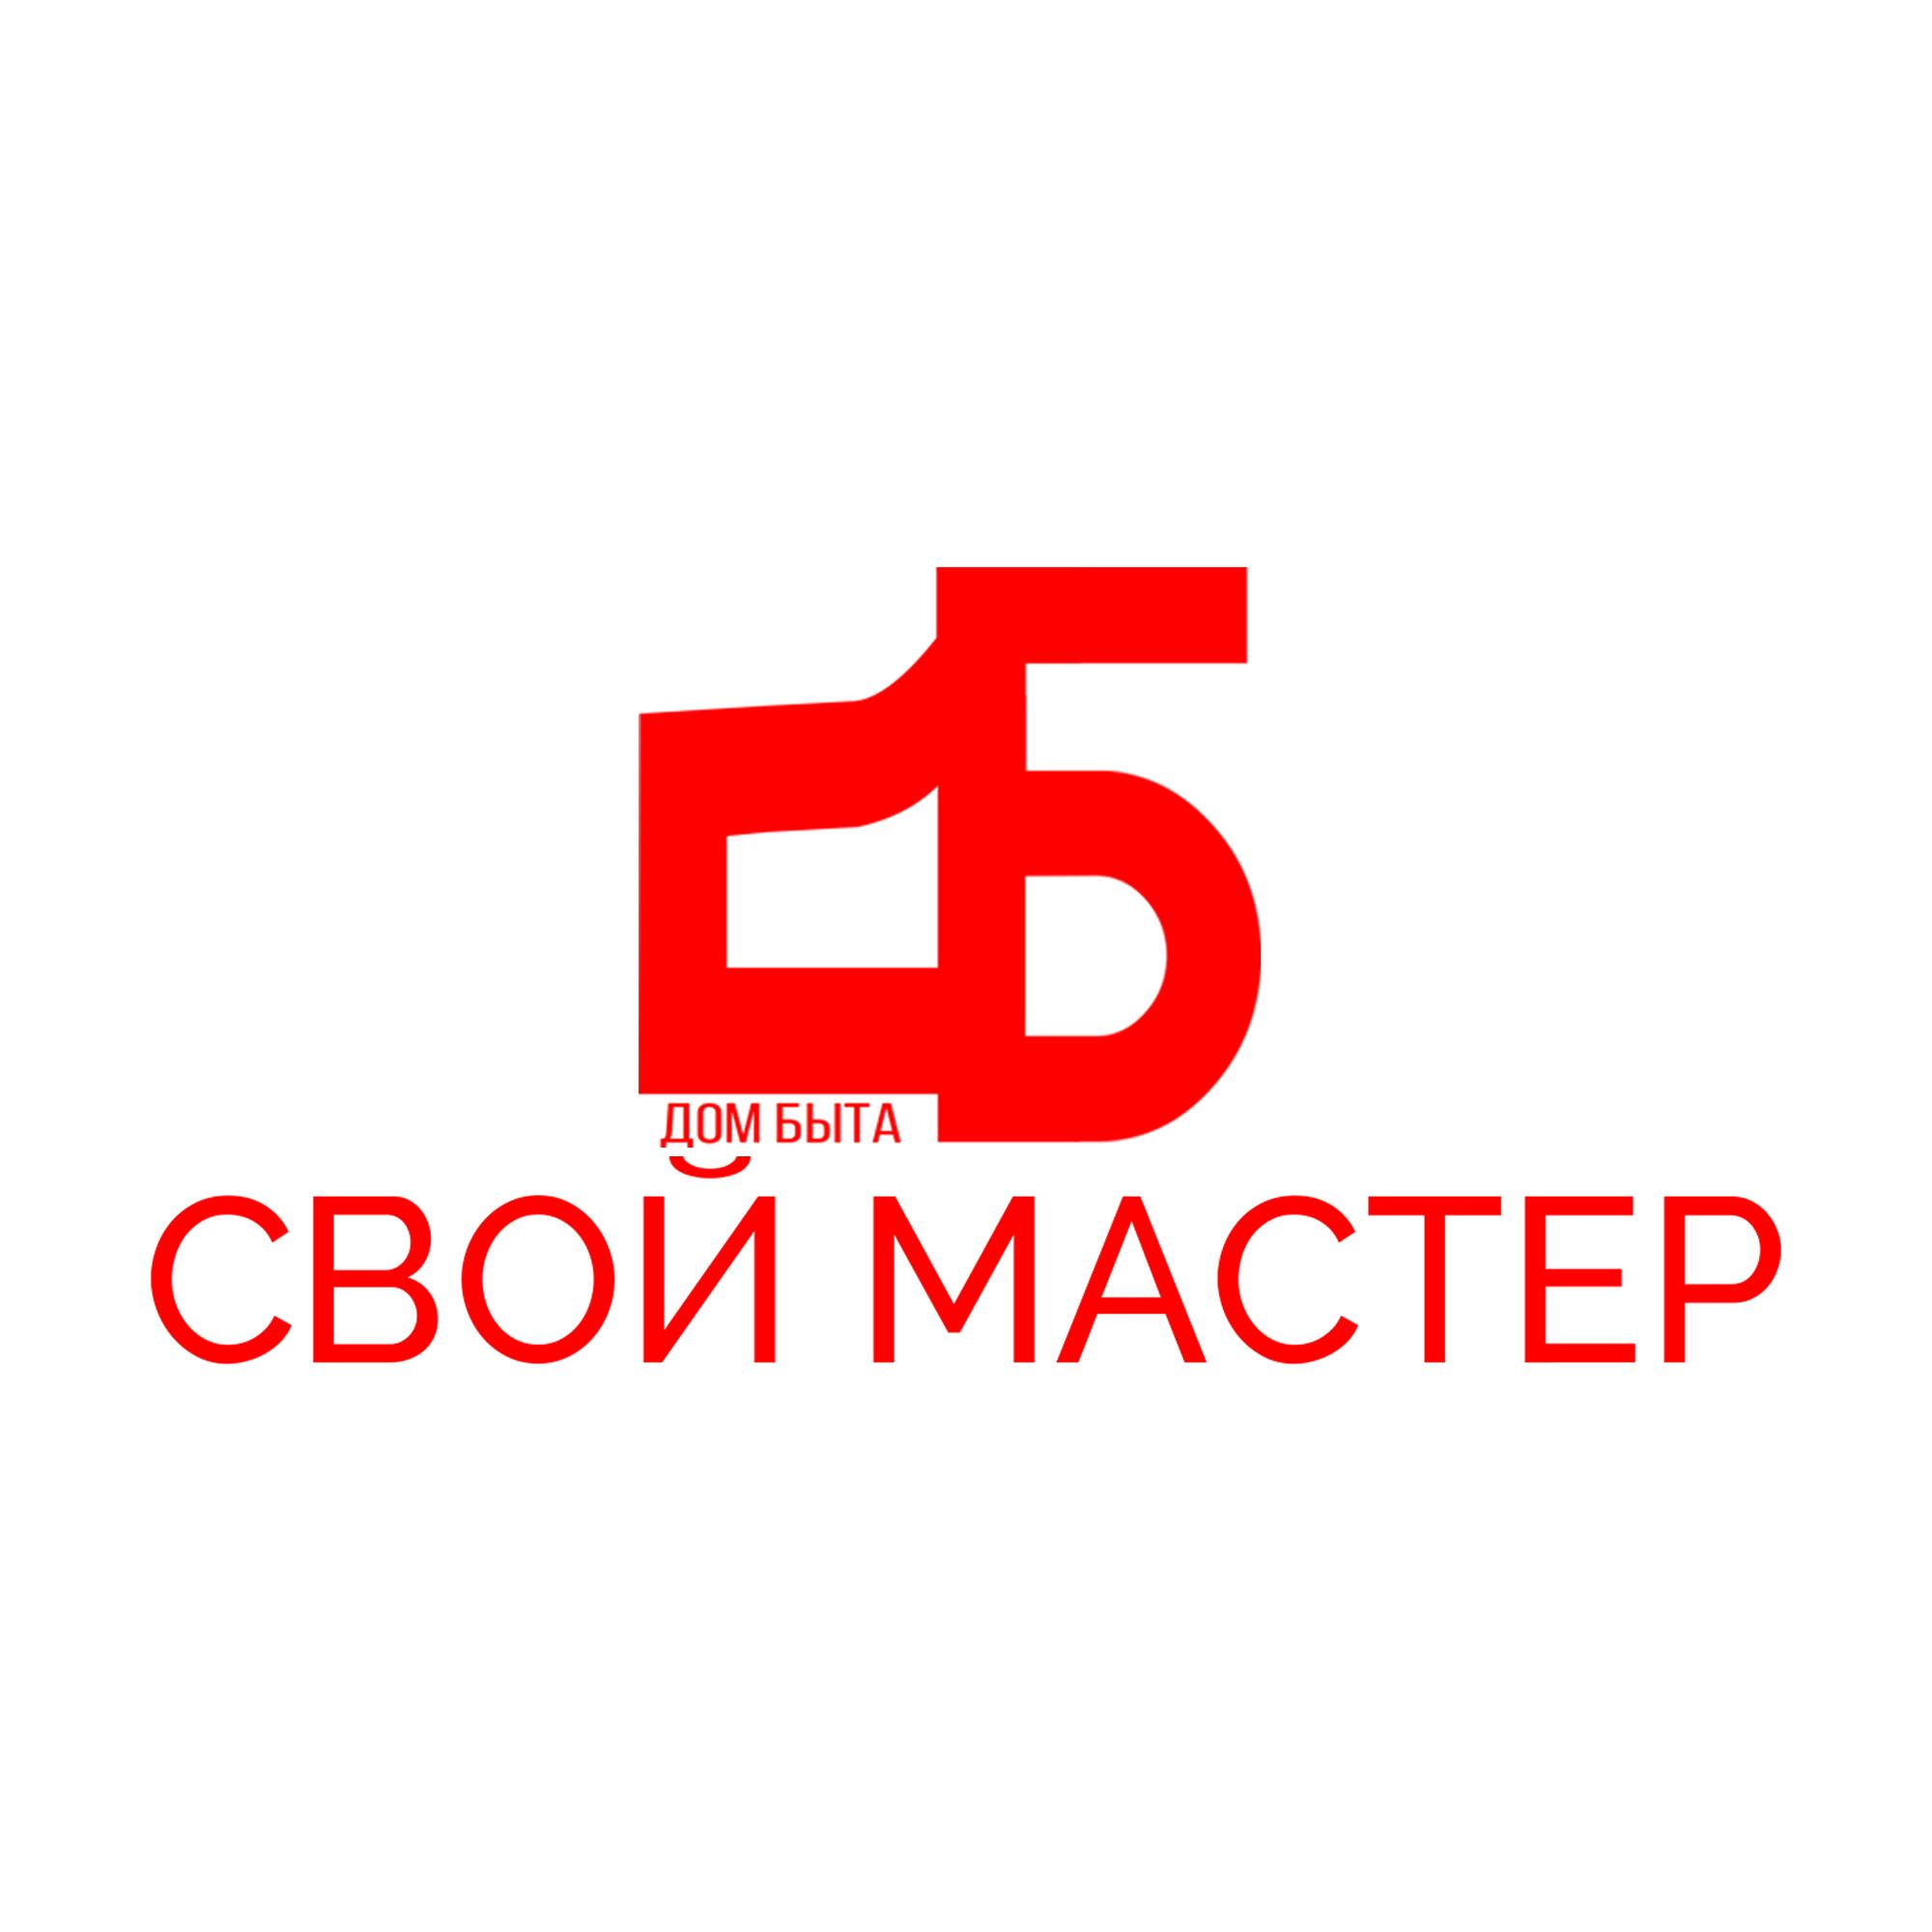 Логотип для сетевого ДОМ БЫТА фото f_6635d7e53c55ed1d.png